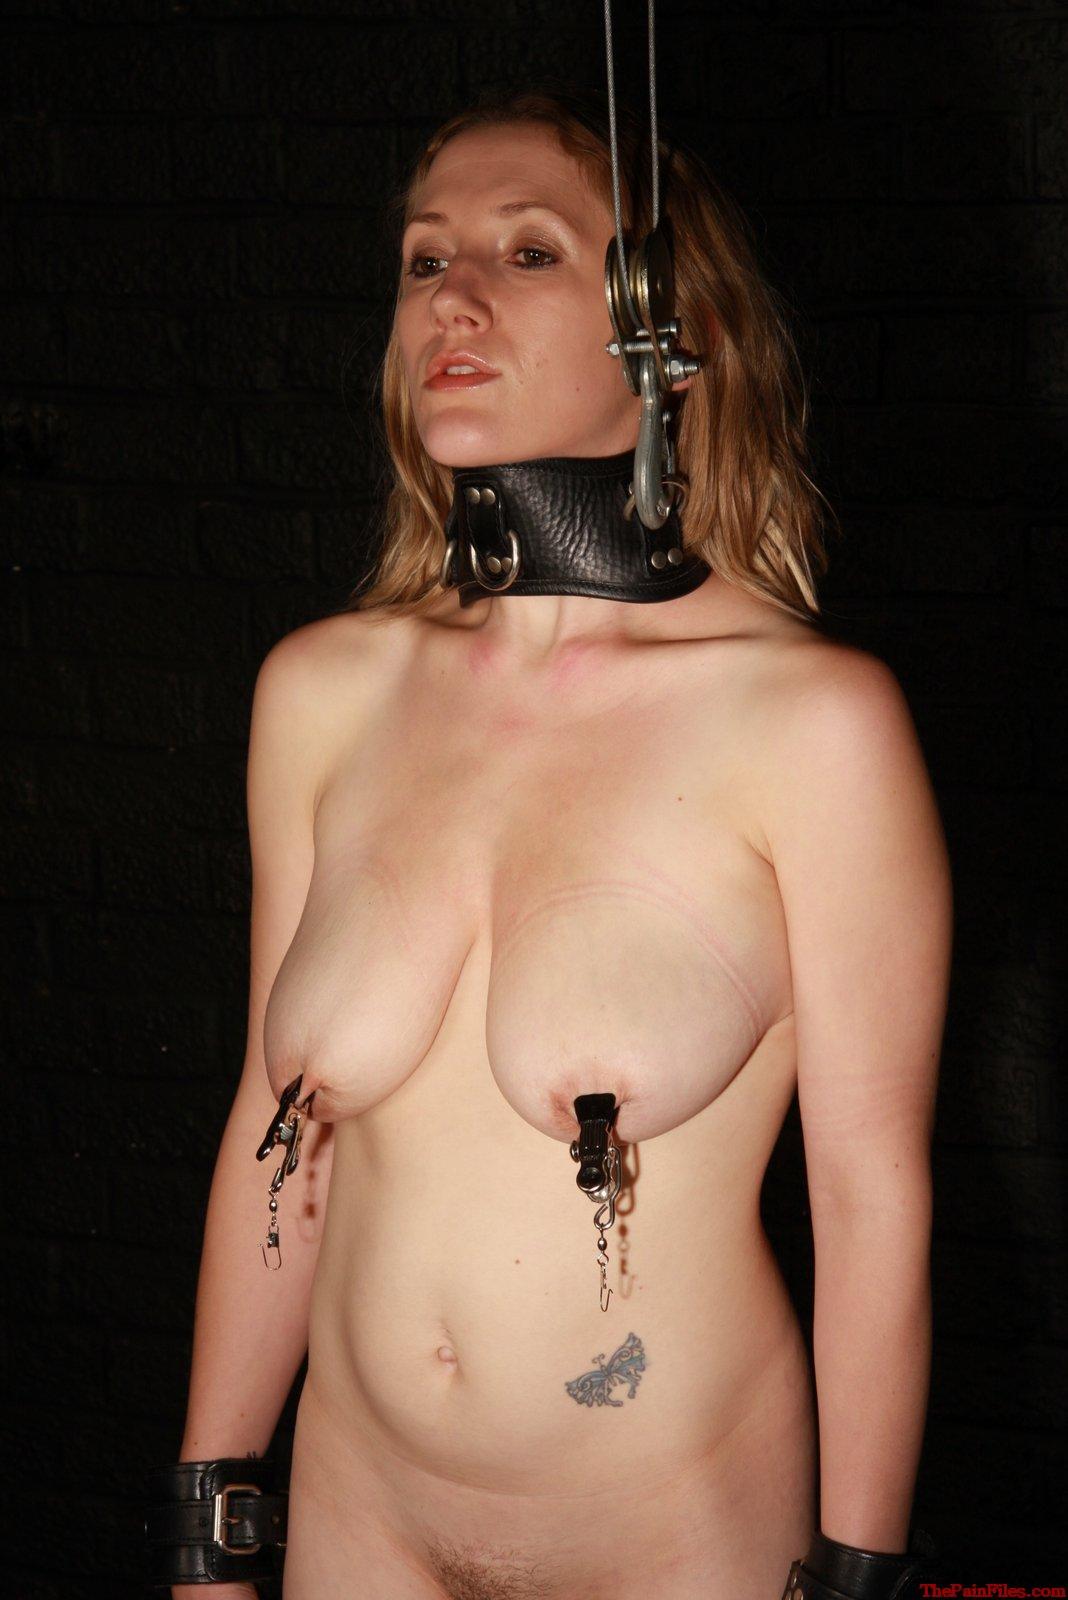 extreme nipple piercing